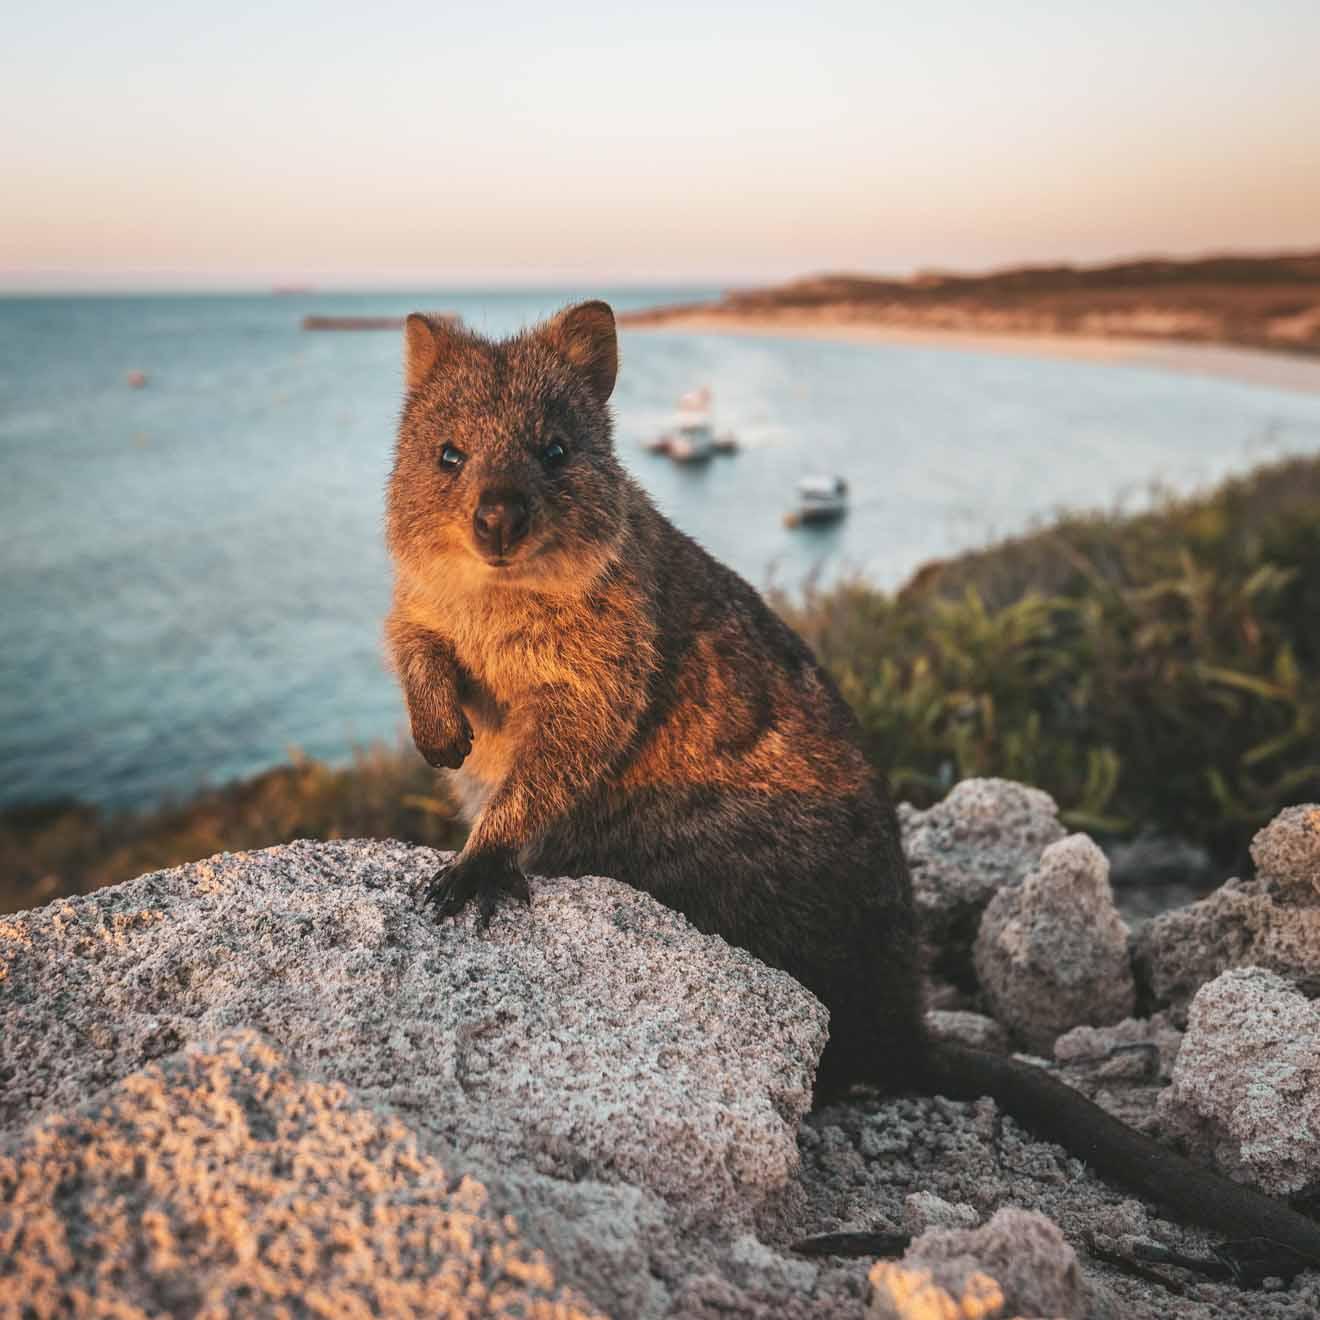 qué hacer en Perth mañana - Quokka en la isla Rottnest